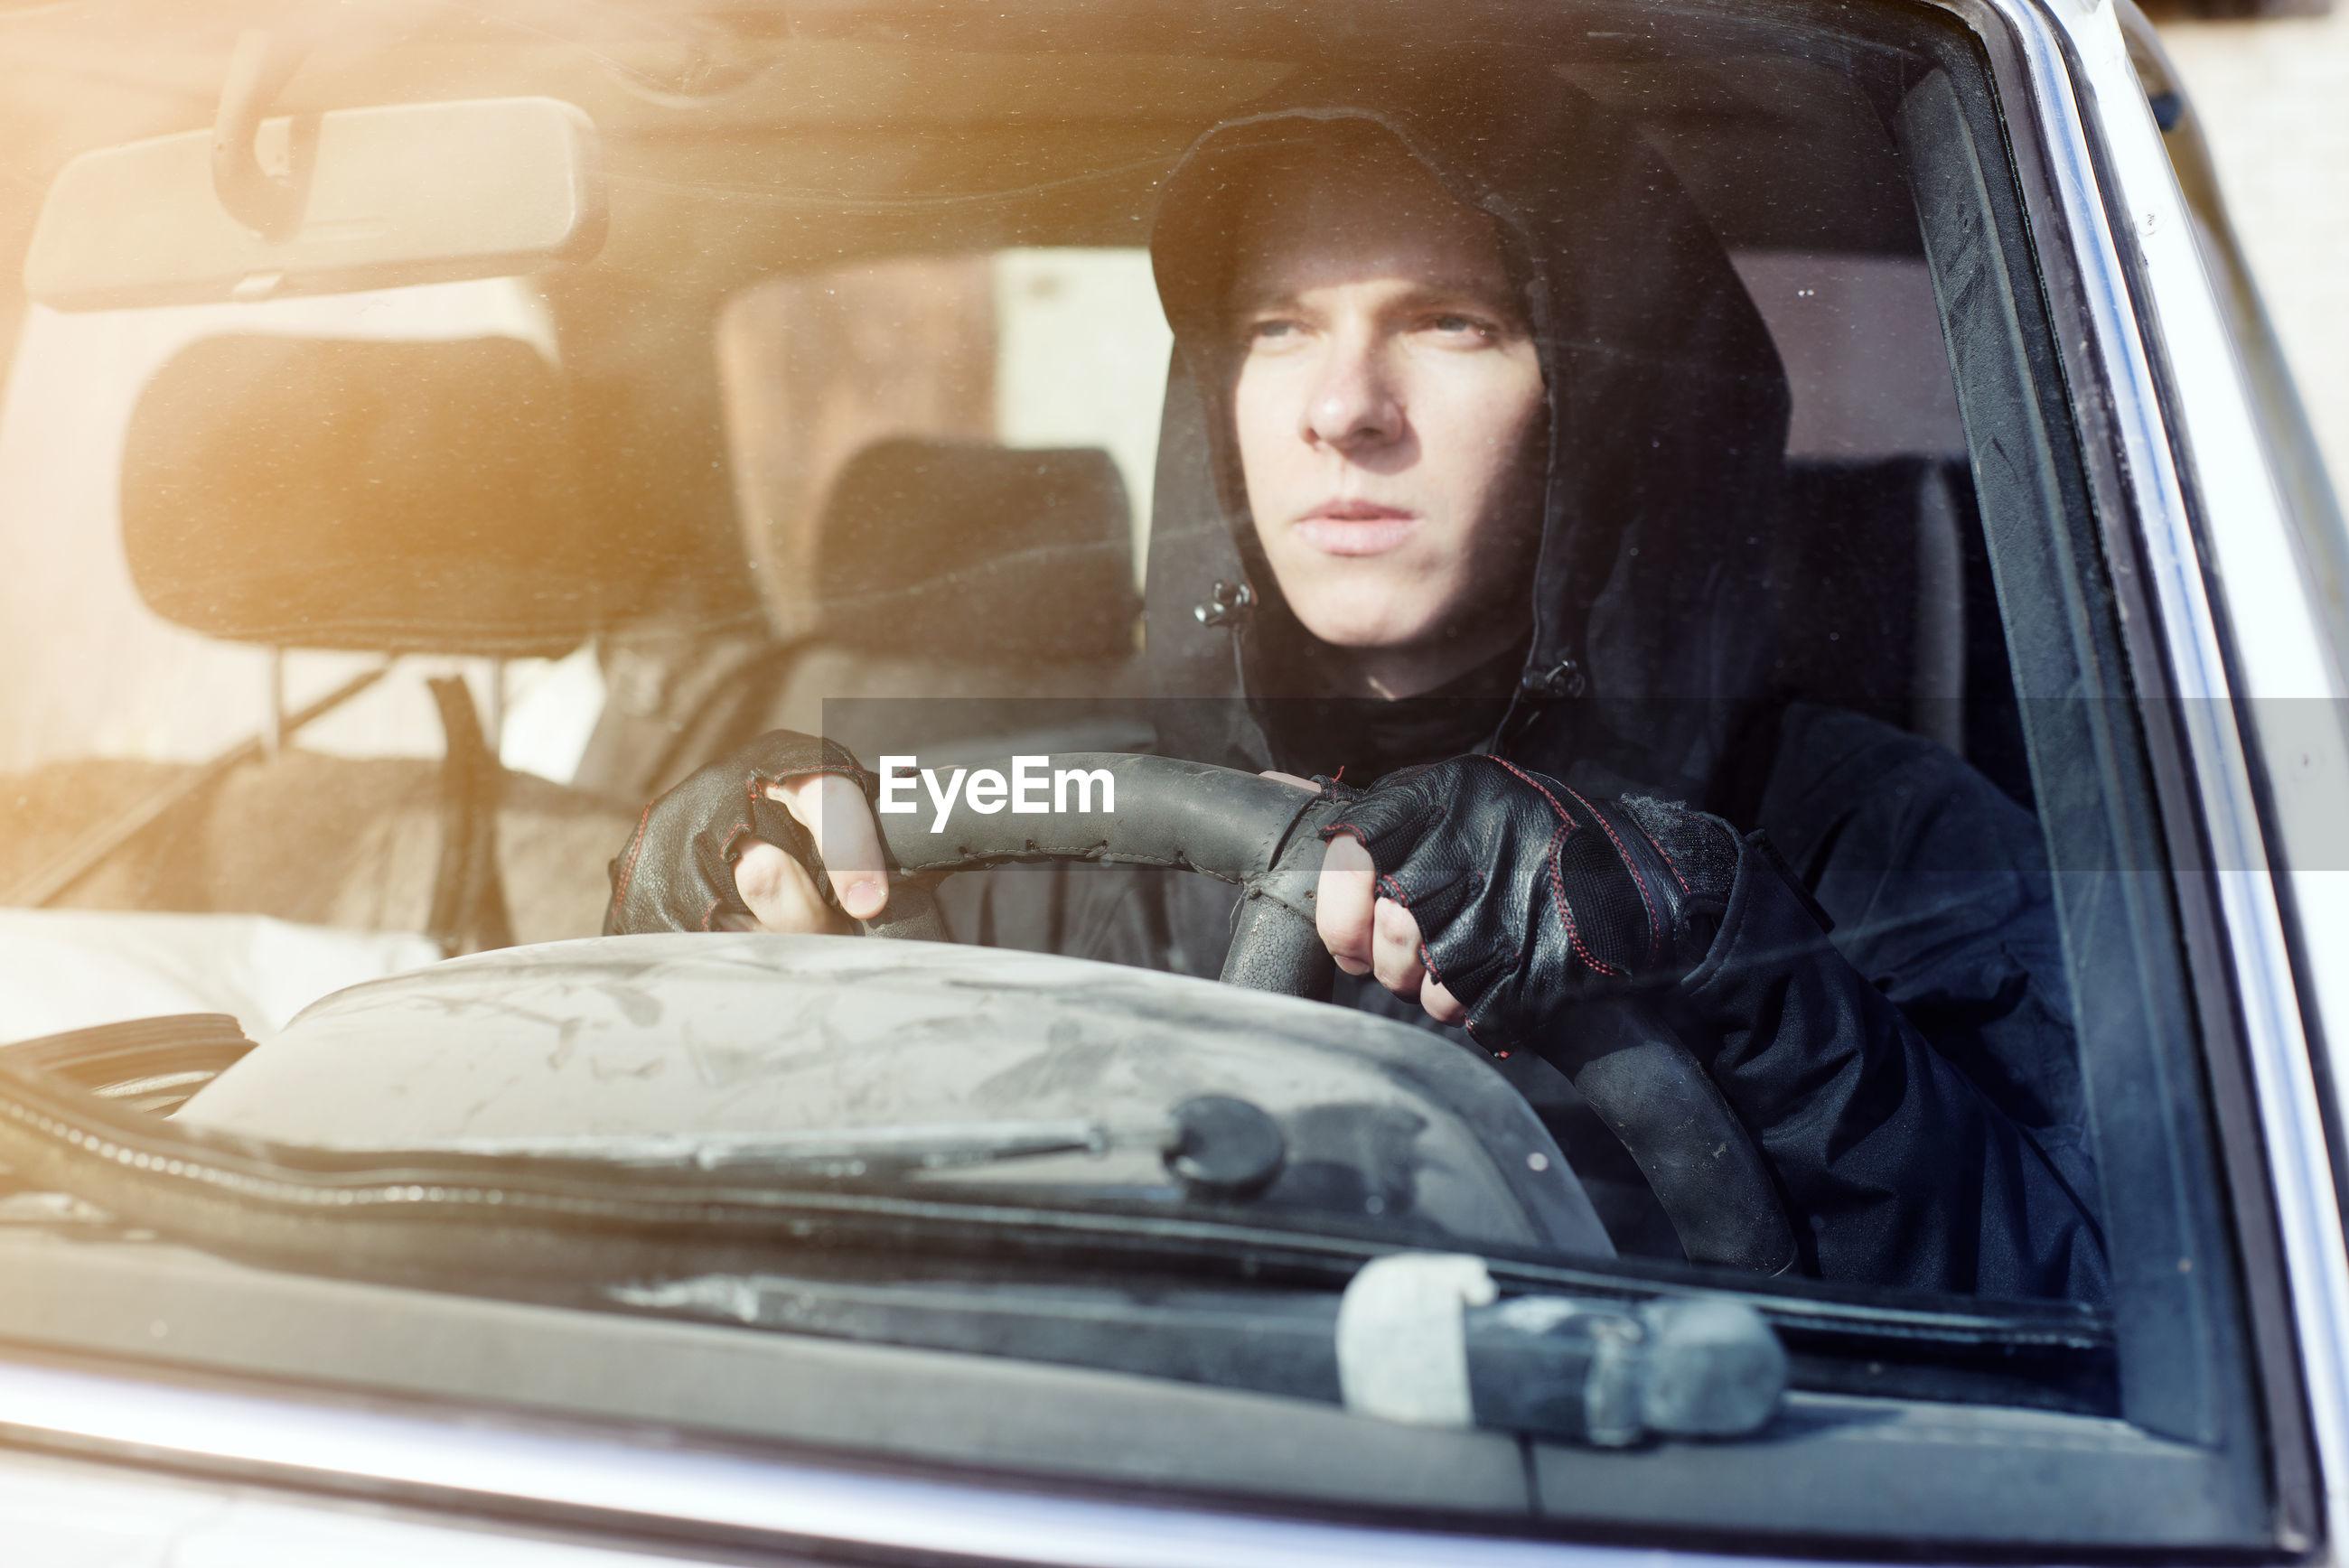 Man wearing hood driving car seen through windshield